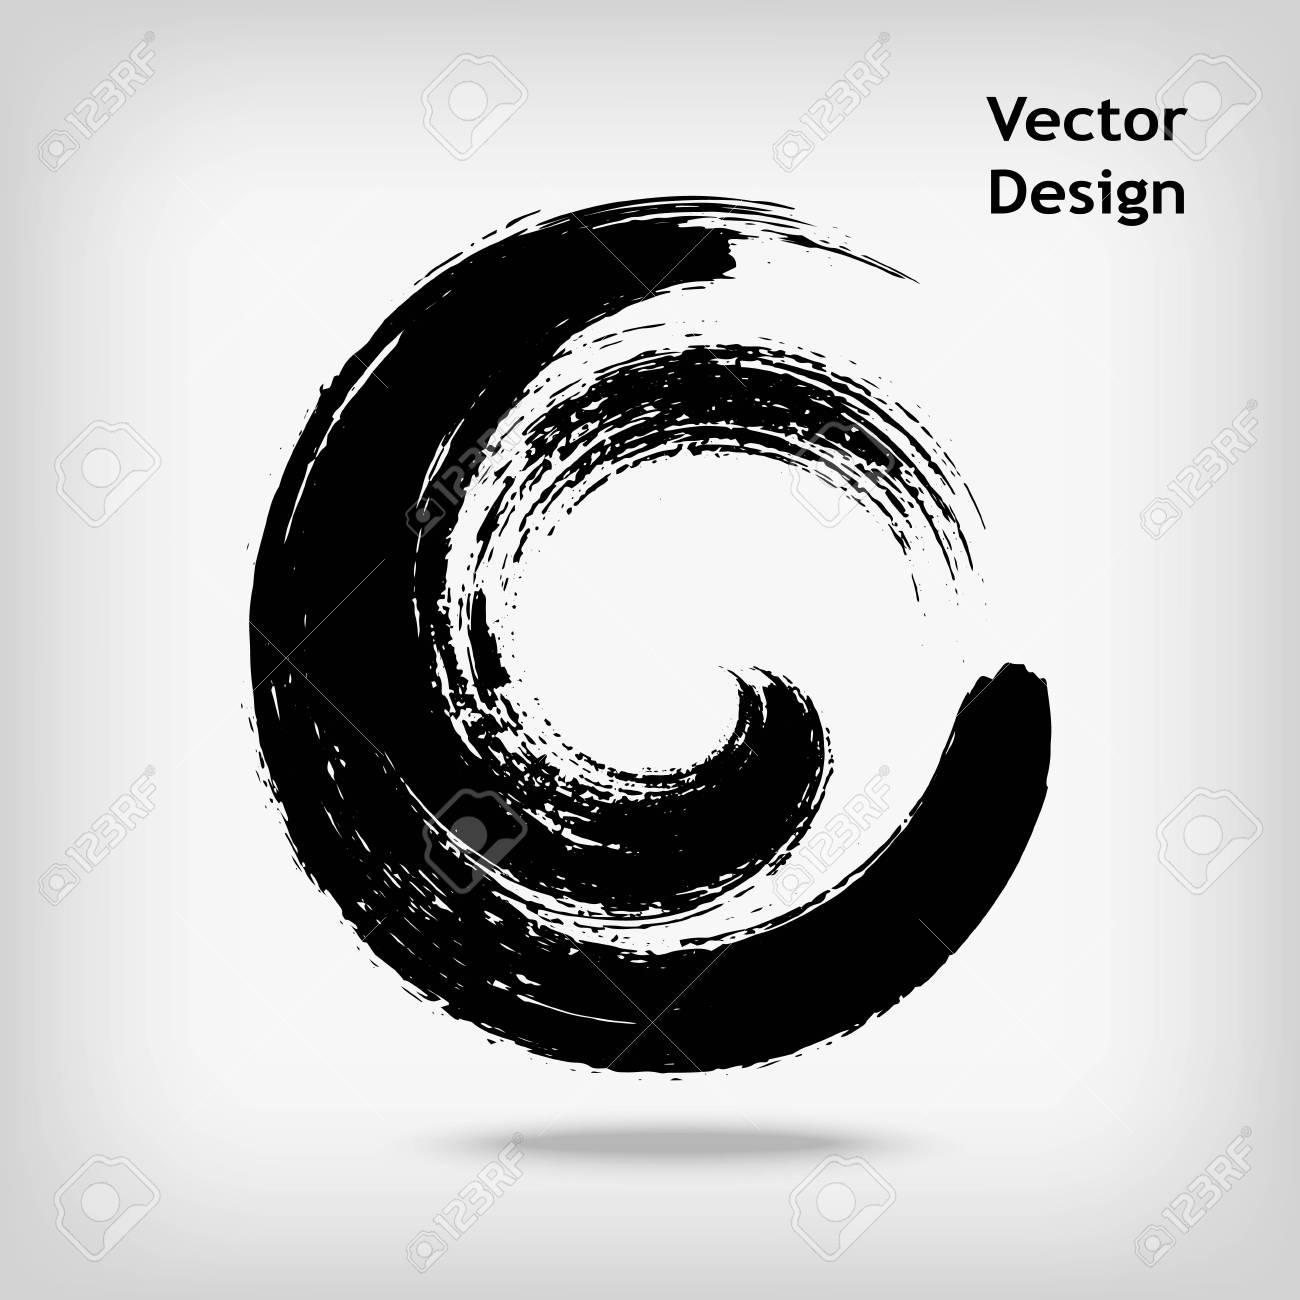 Artistic creative painted circle for logo, label, branding. Black enso zen round. Vector illustration. - 67556627